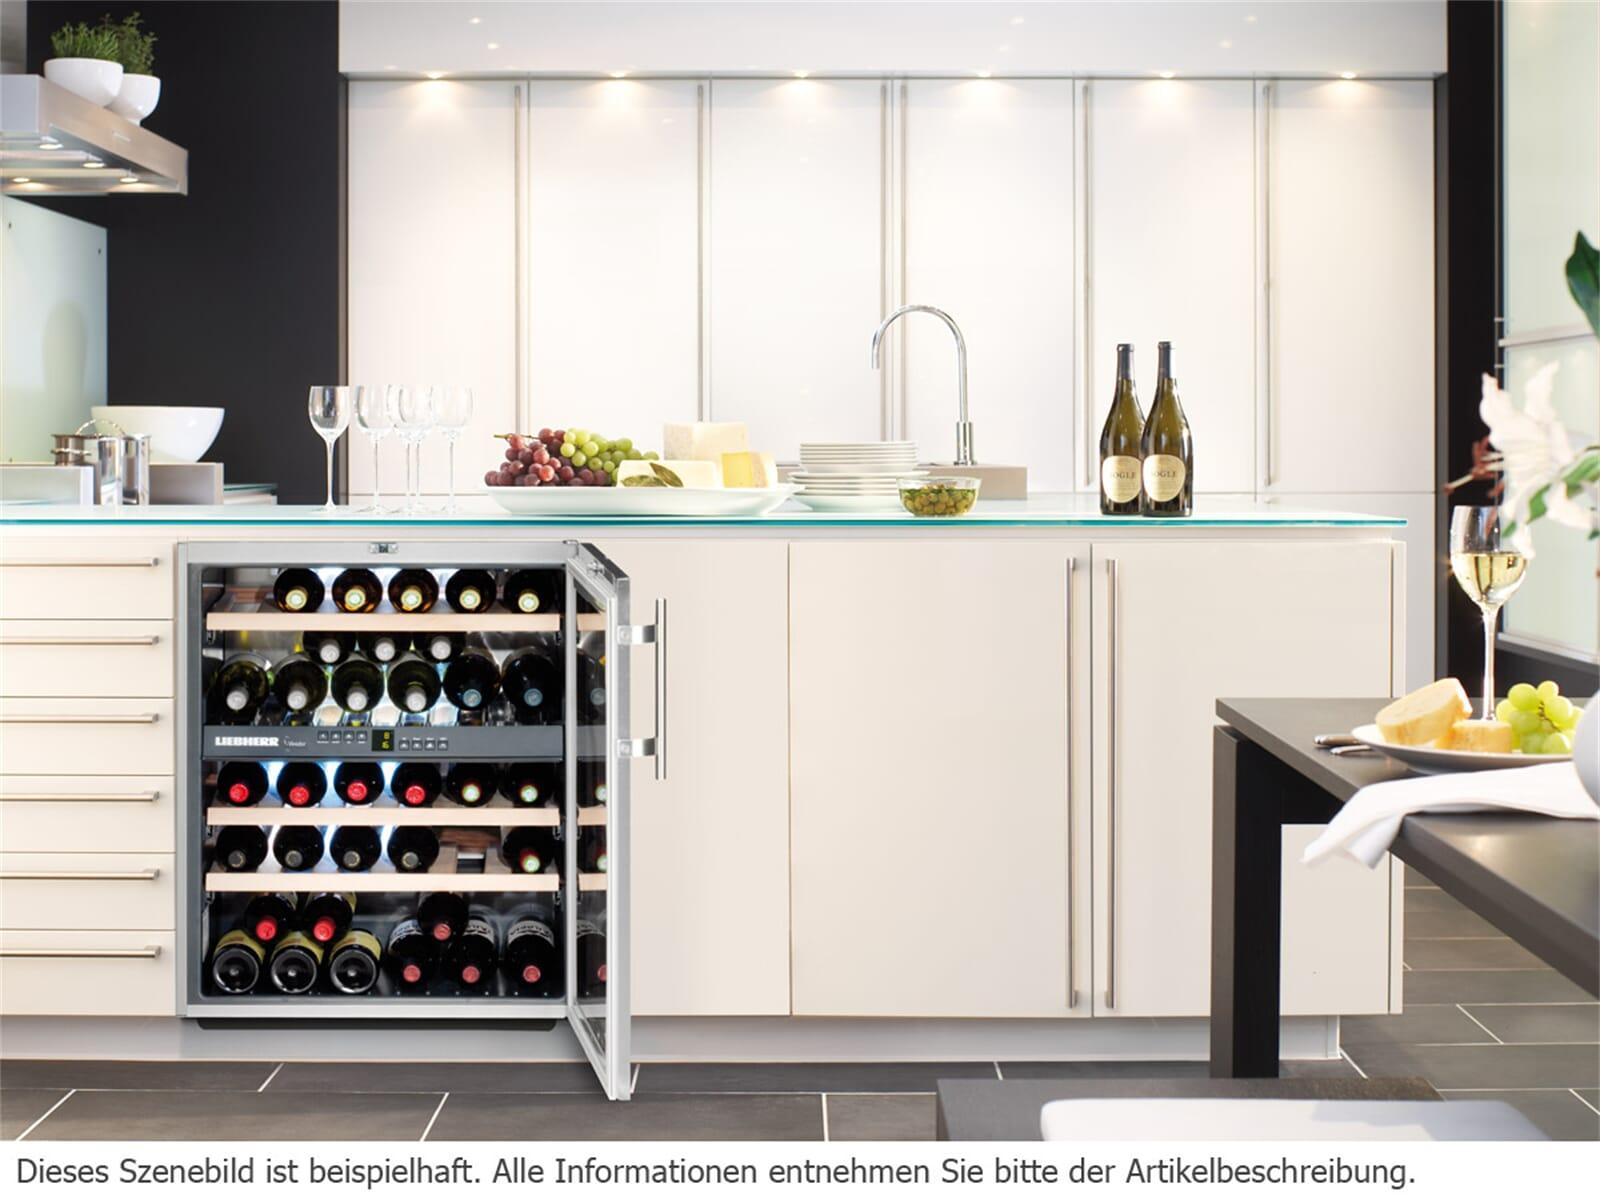 liebherr wtues1653 vinidor unterbau weink hlschrank f r 1743 90 eur. Black Bedroom Furniture Sets. Home Design Ideas